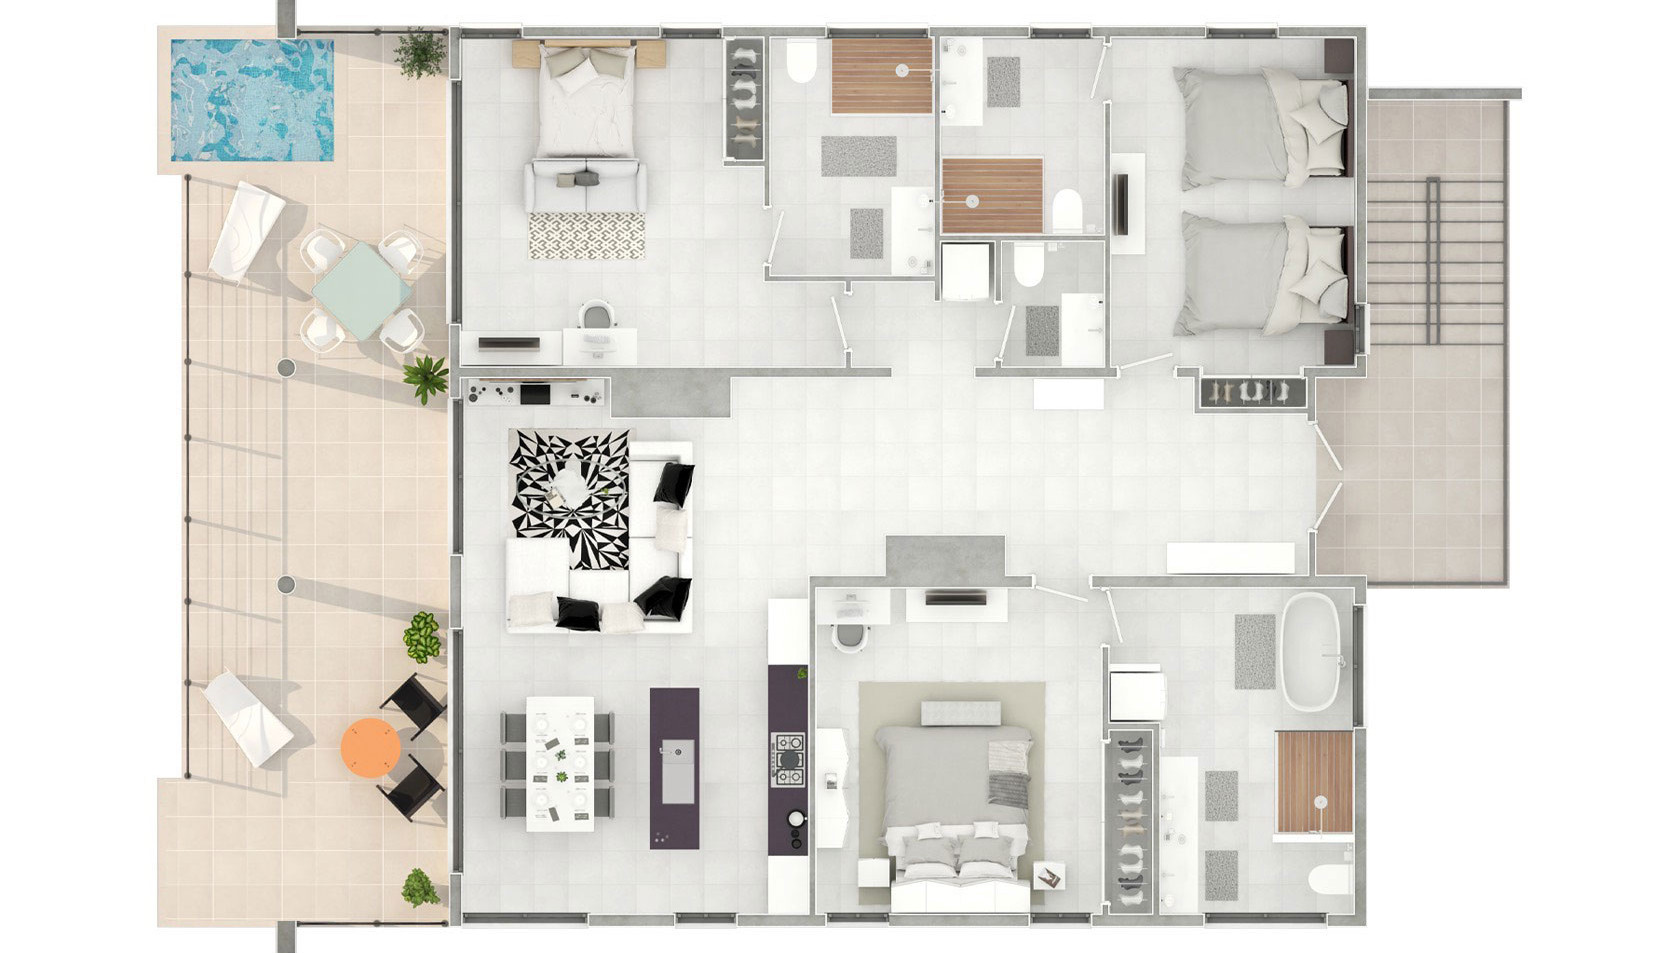 3 bedroom penthouse floor plan.jpg